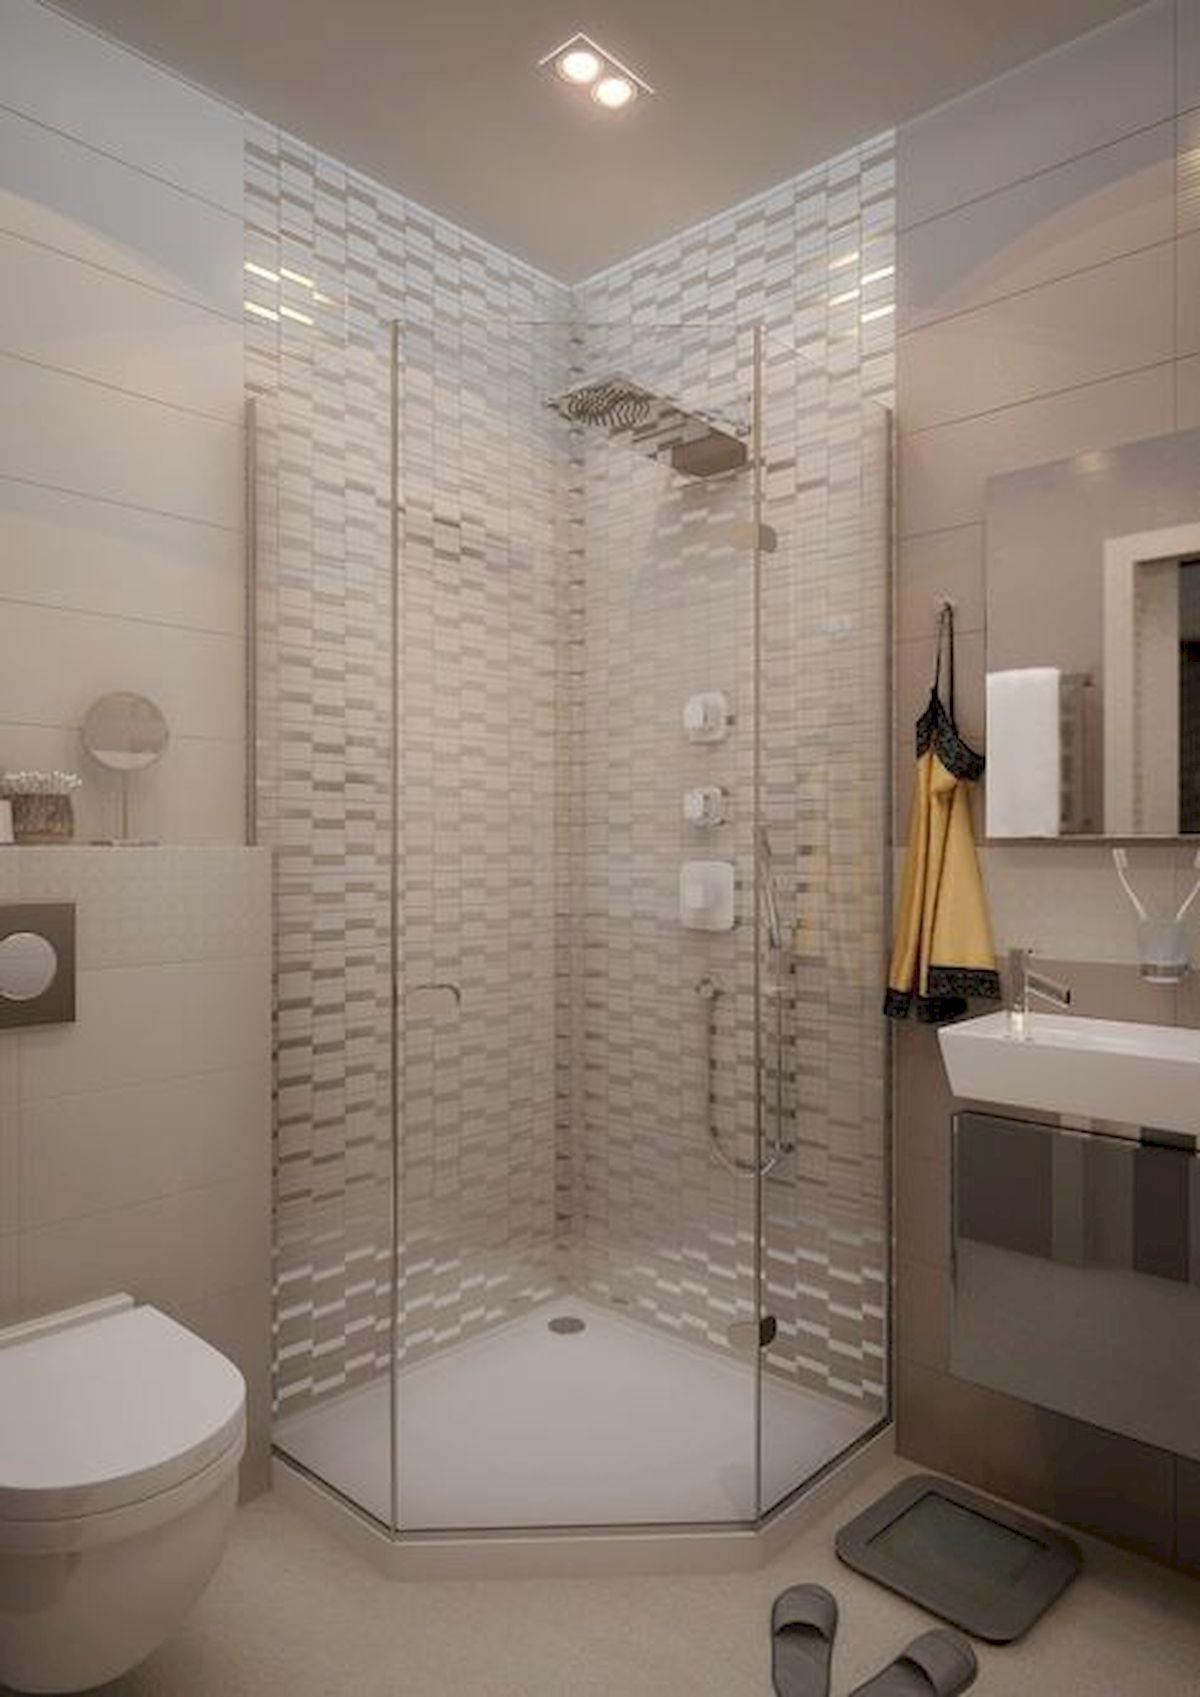 30 Convenient Basement Bathroom Ideas And Design 2020 In 2020 Small Bathroom Makeover Bathroom Layout Bathroom Interior Design